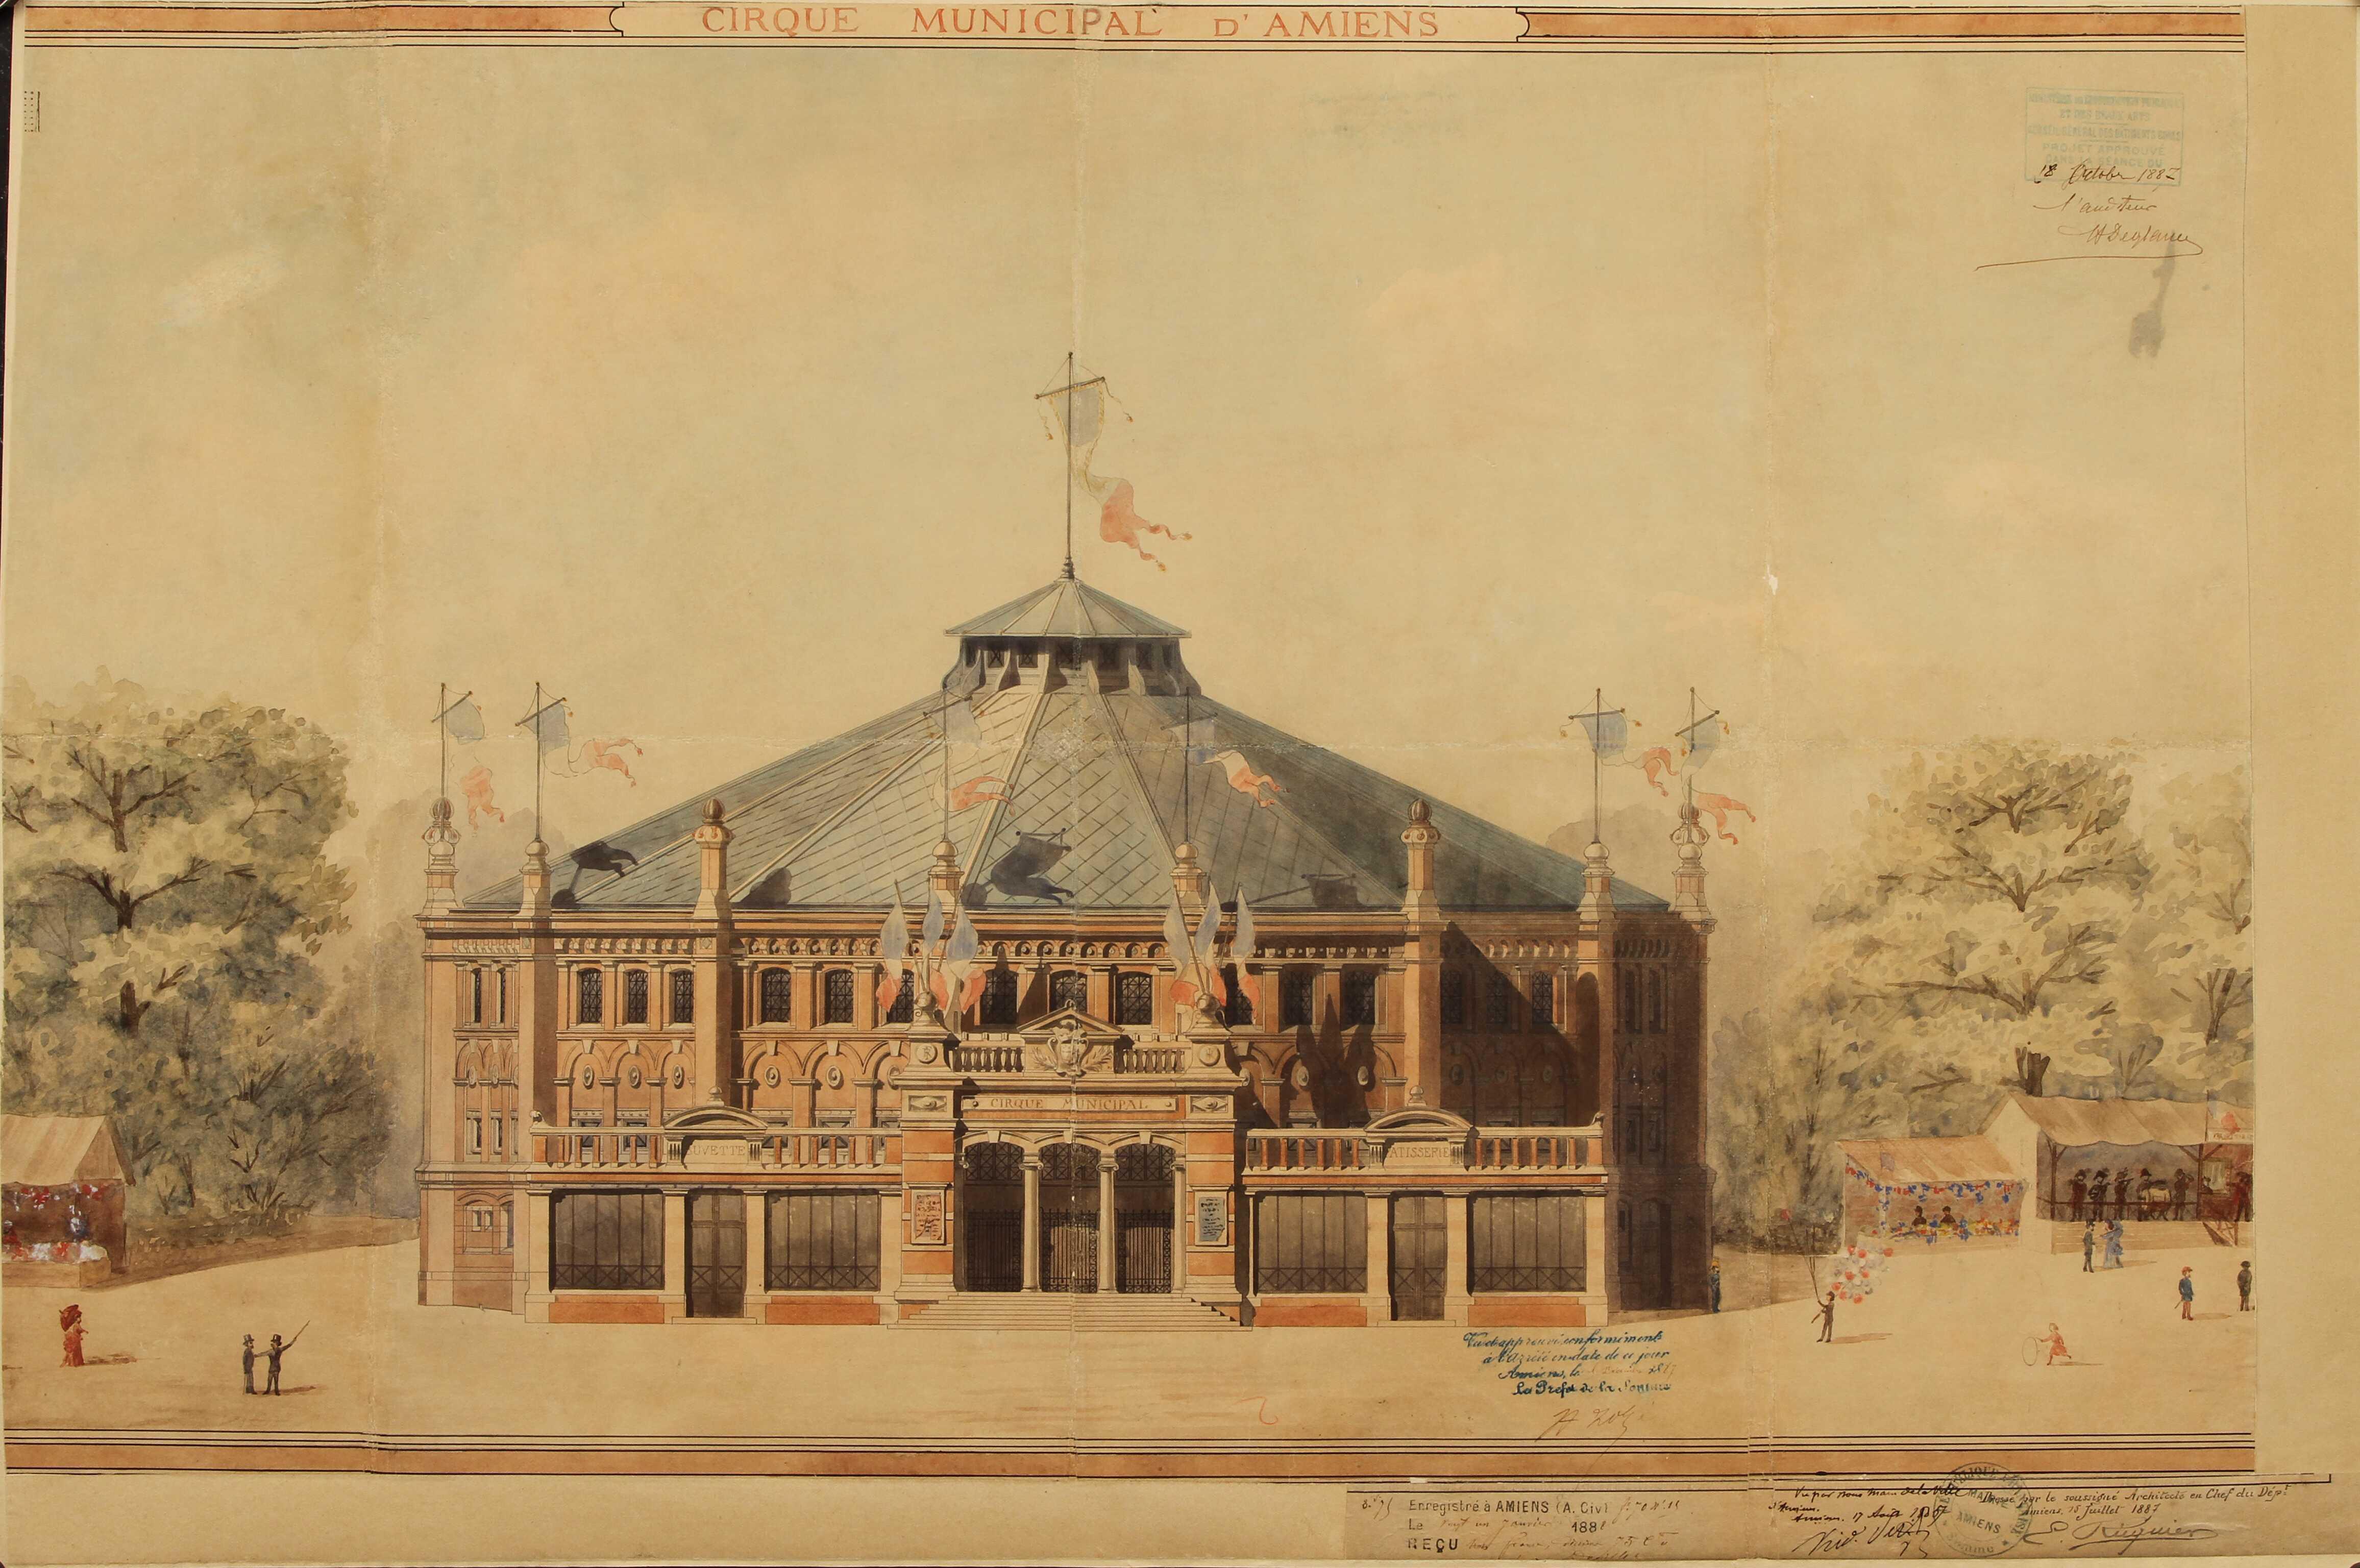 Cirque municipal d'Amiens